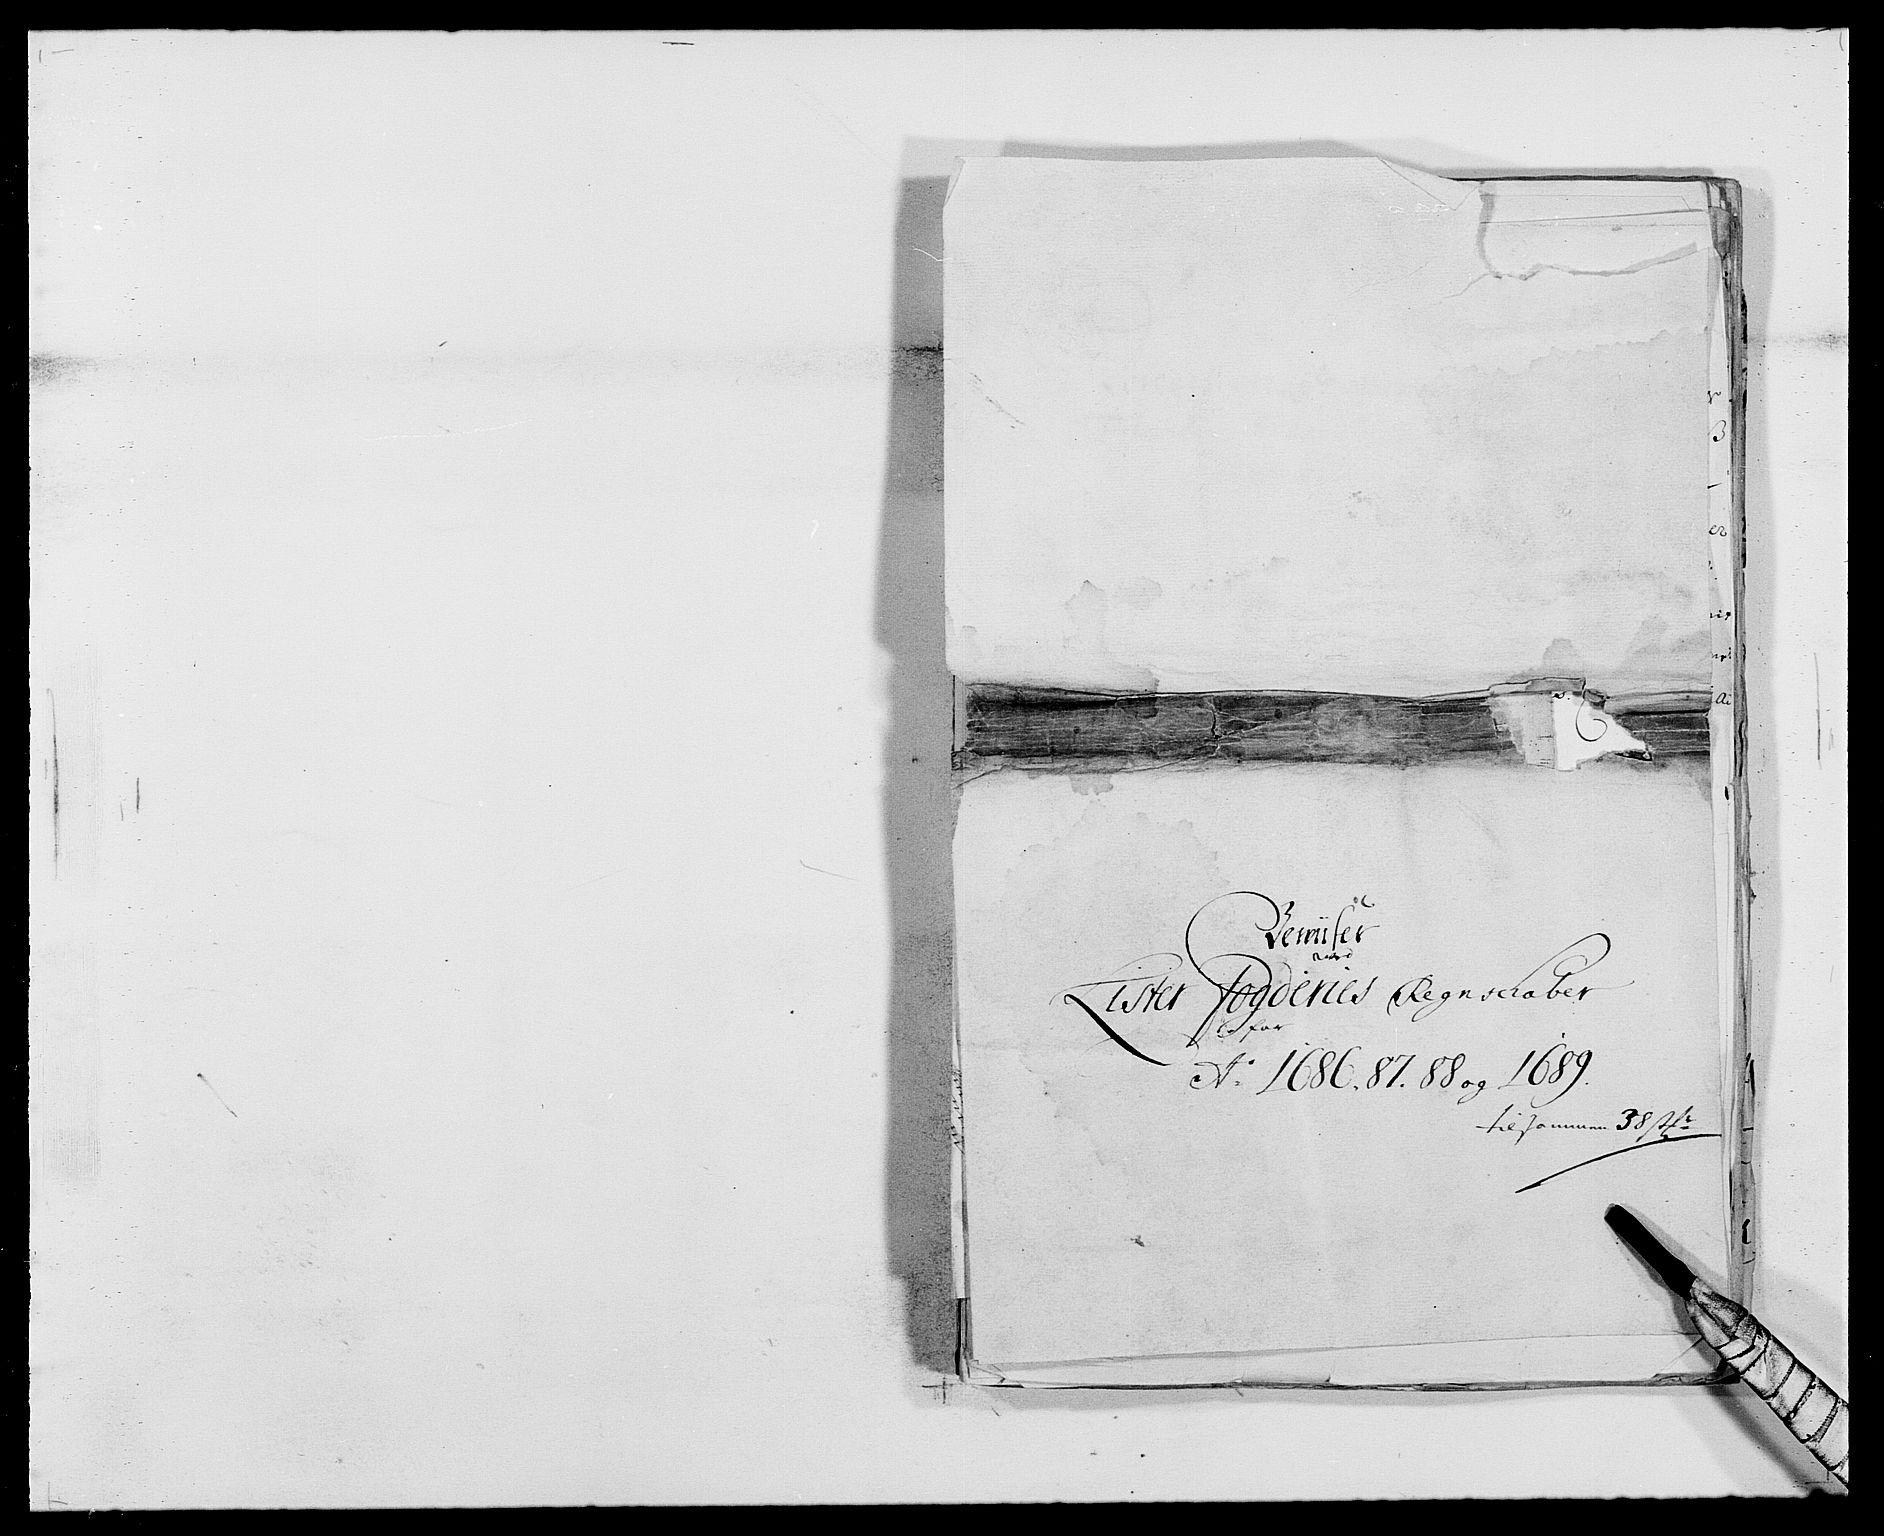 RA, Rentekammeret inntil 1814, Reviderte regnskaper, Fogderegnskap, R41/L2535: Fogderegnskap Lista, 1686-1689, s. 36